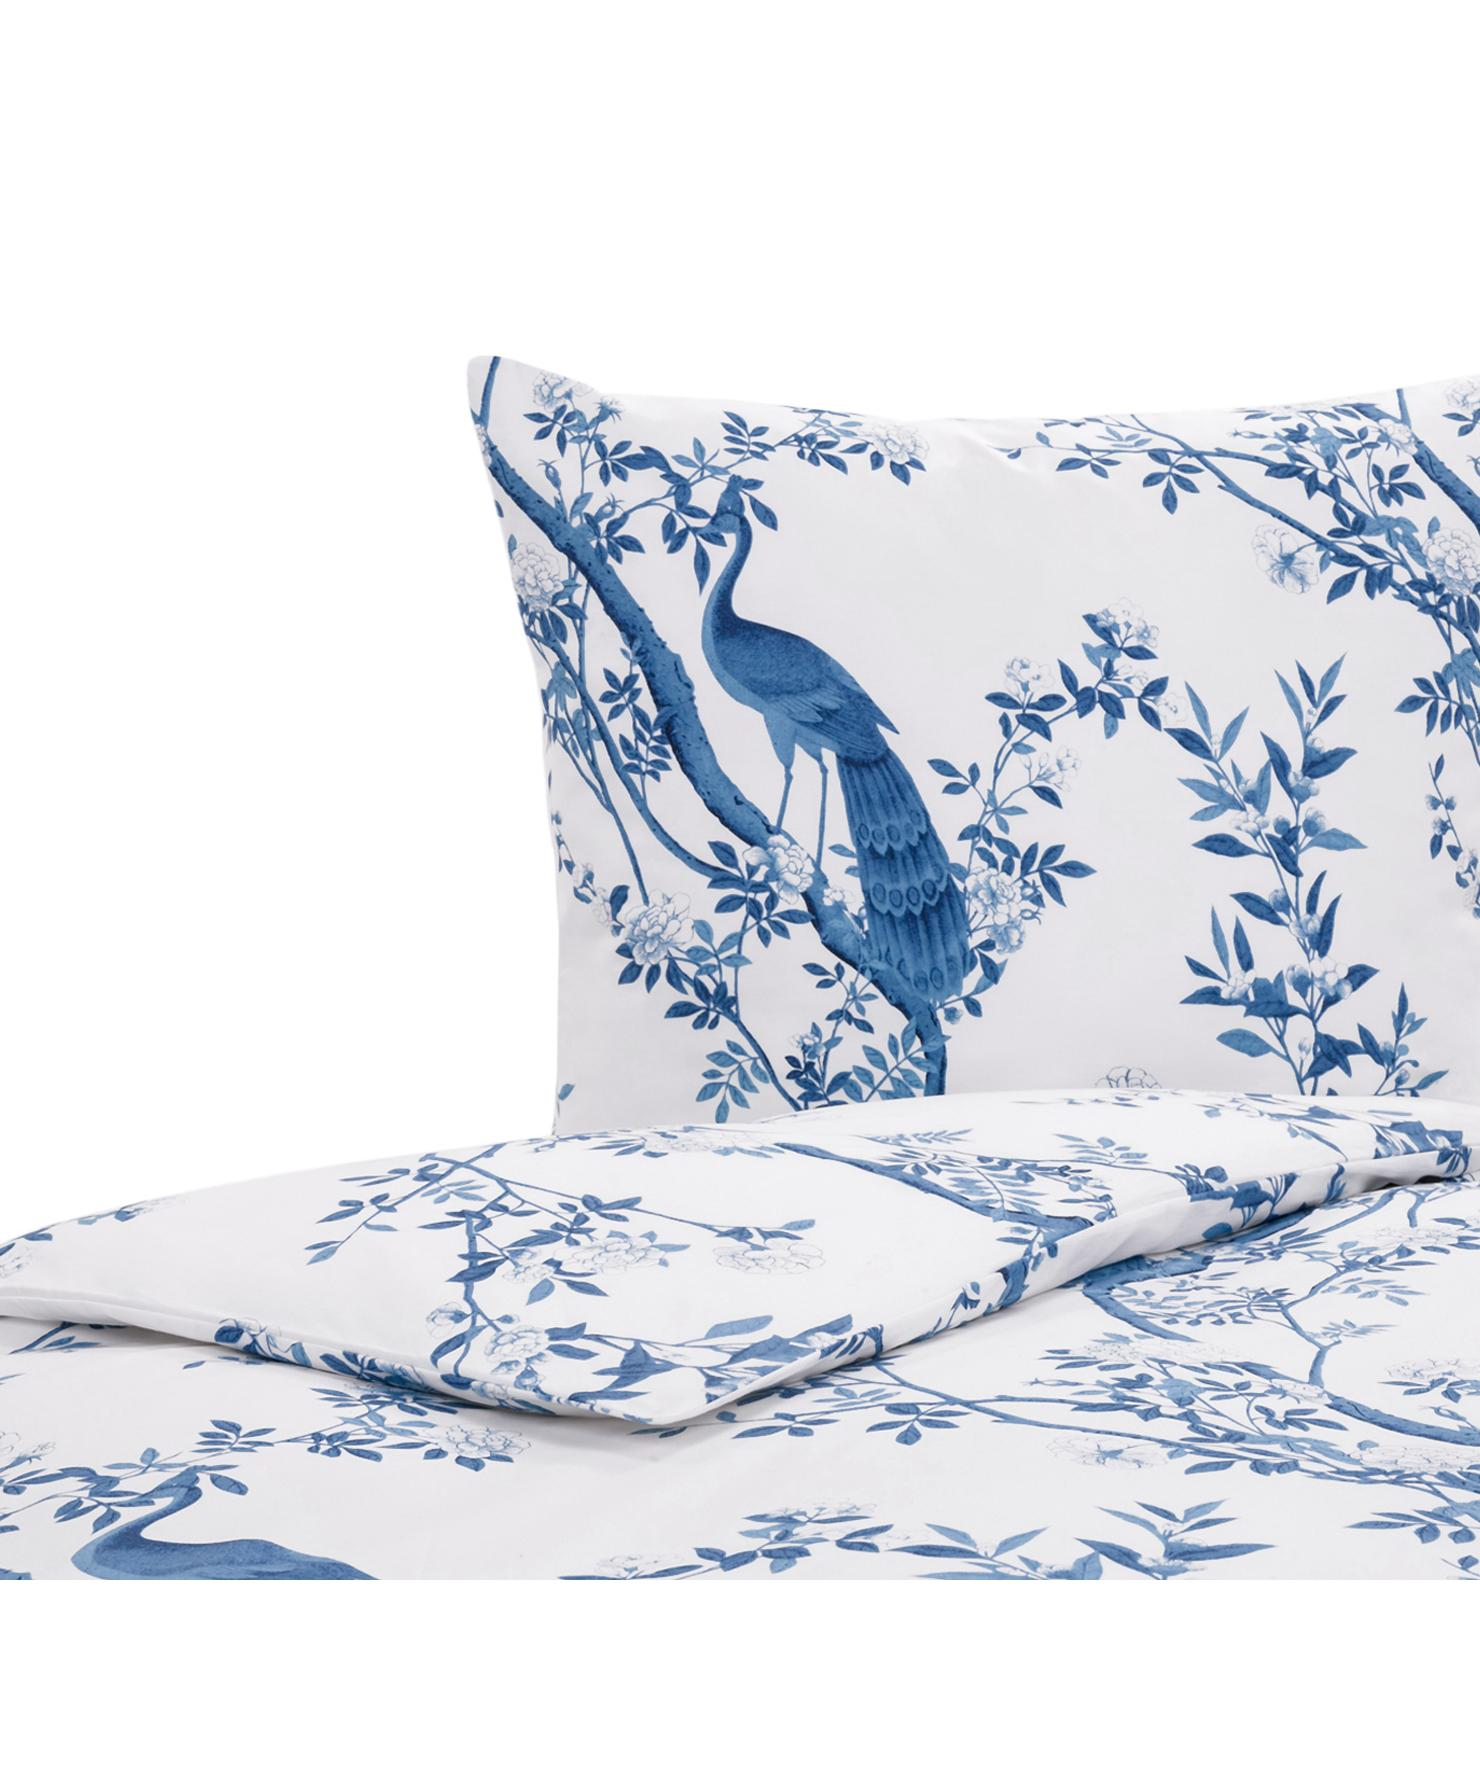 Parure copripiumino in percalle Annabelle, Tessuto: percalle, Blu,bianco, 155 x 200 cm